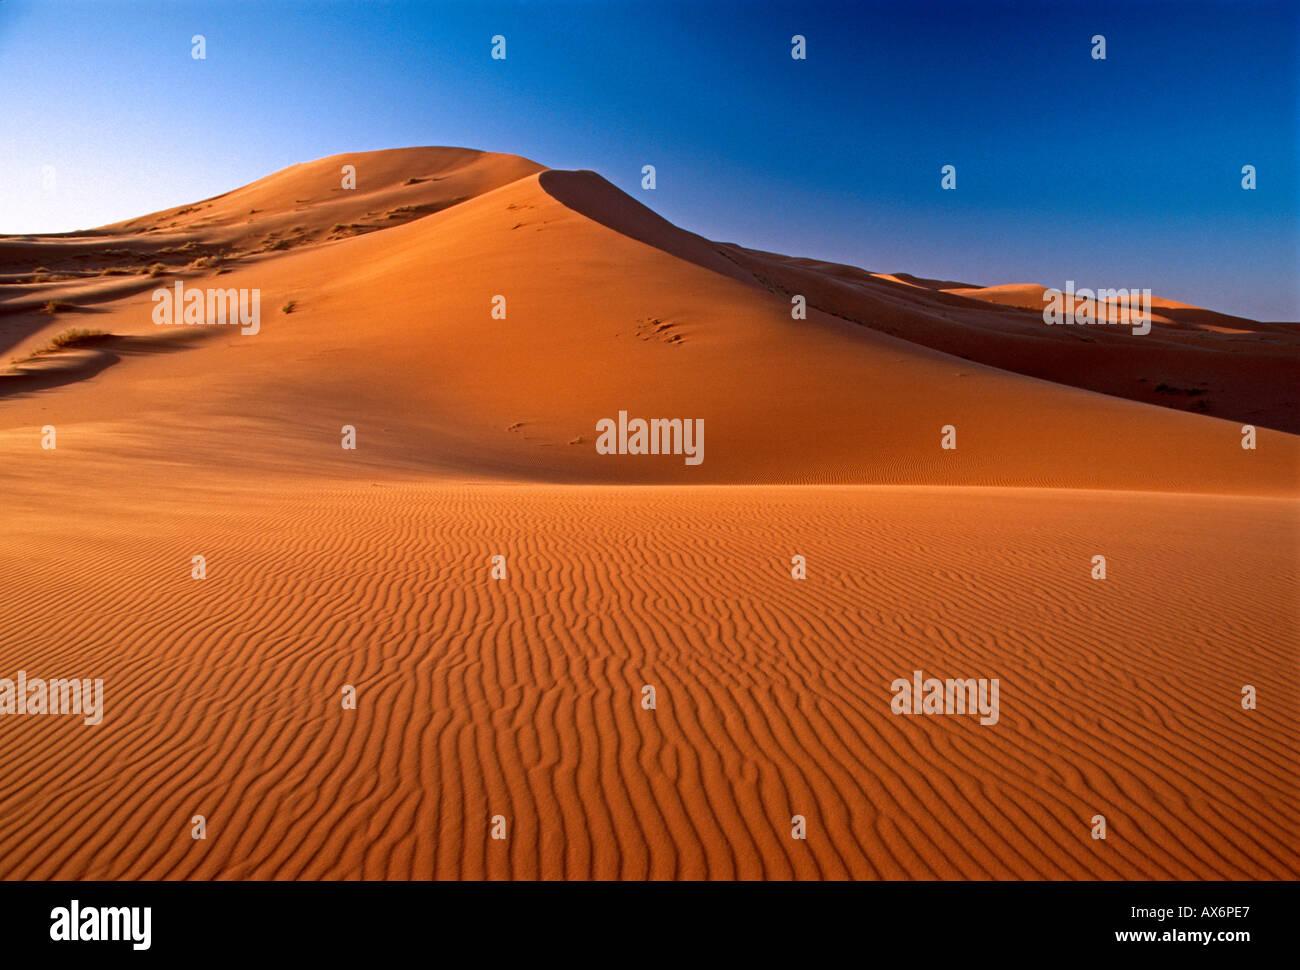 sand dune, sand dunes, Erg Chebbi, Sahara Desert, sunrise, dawn, daybreak, landscape, Merzouga, Errachidia Province, Stock Photo